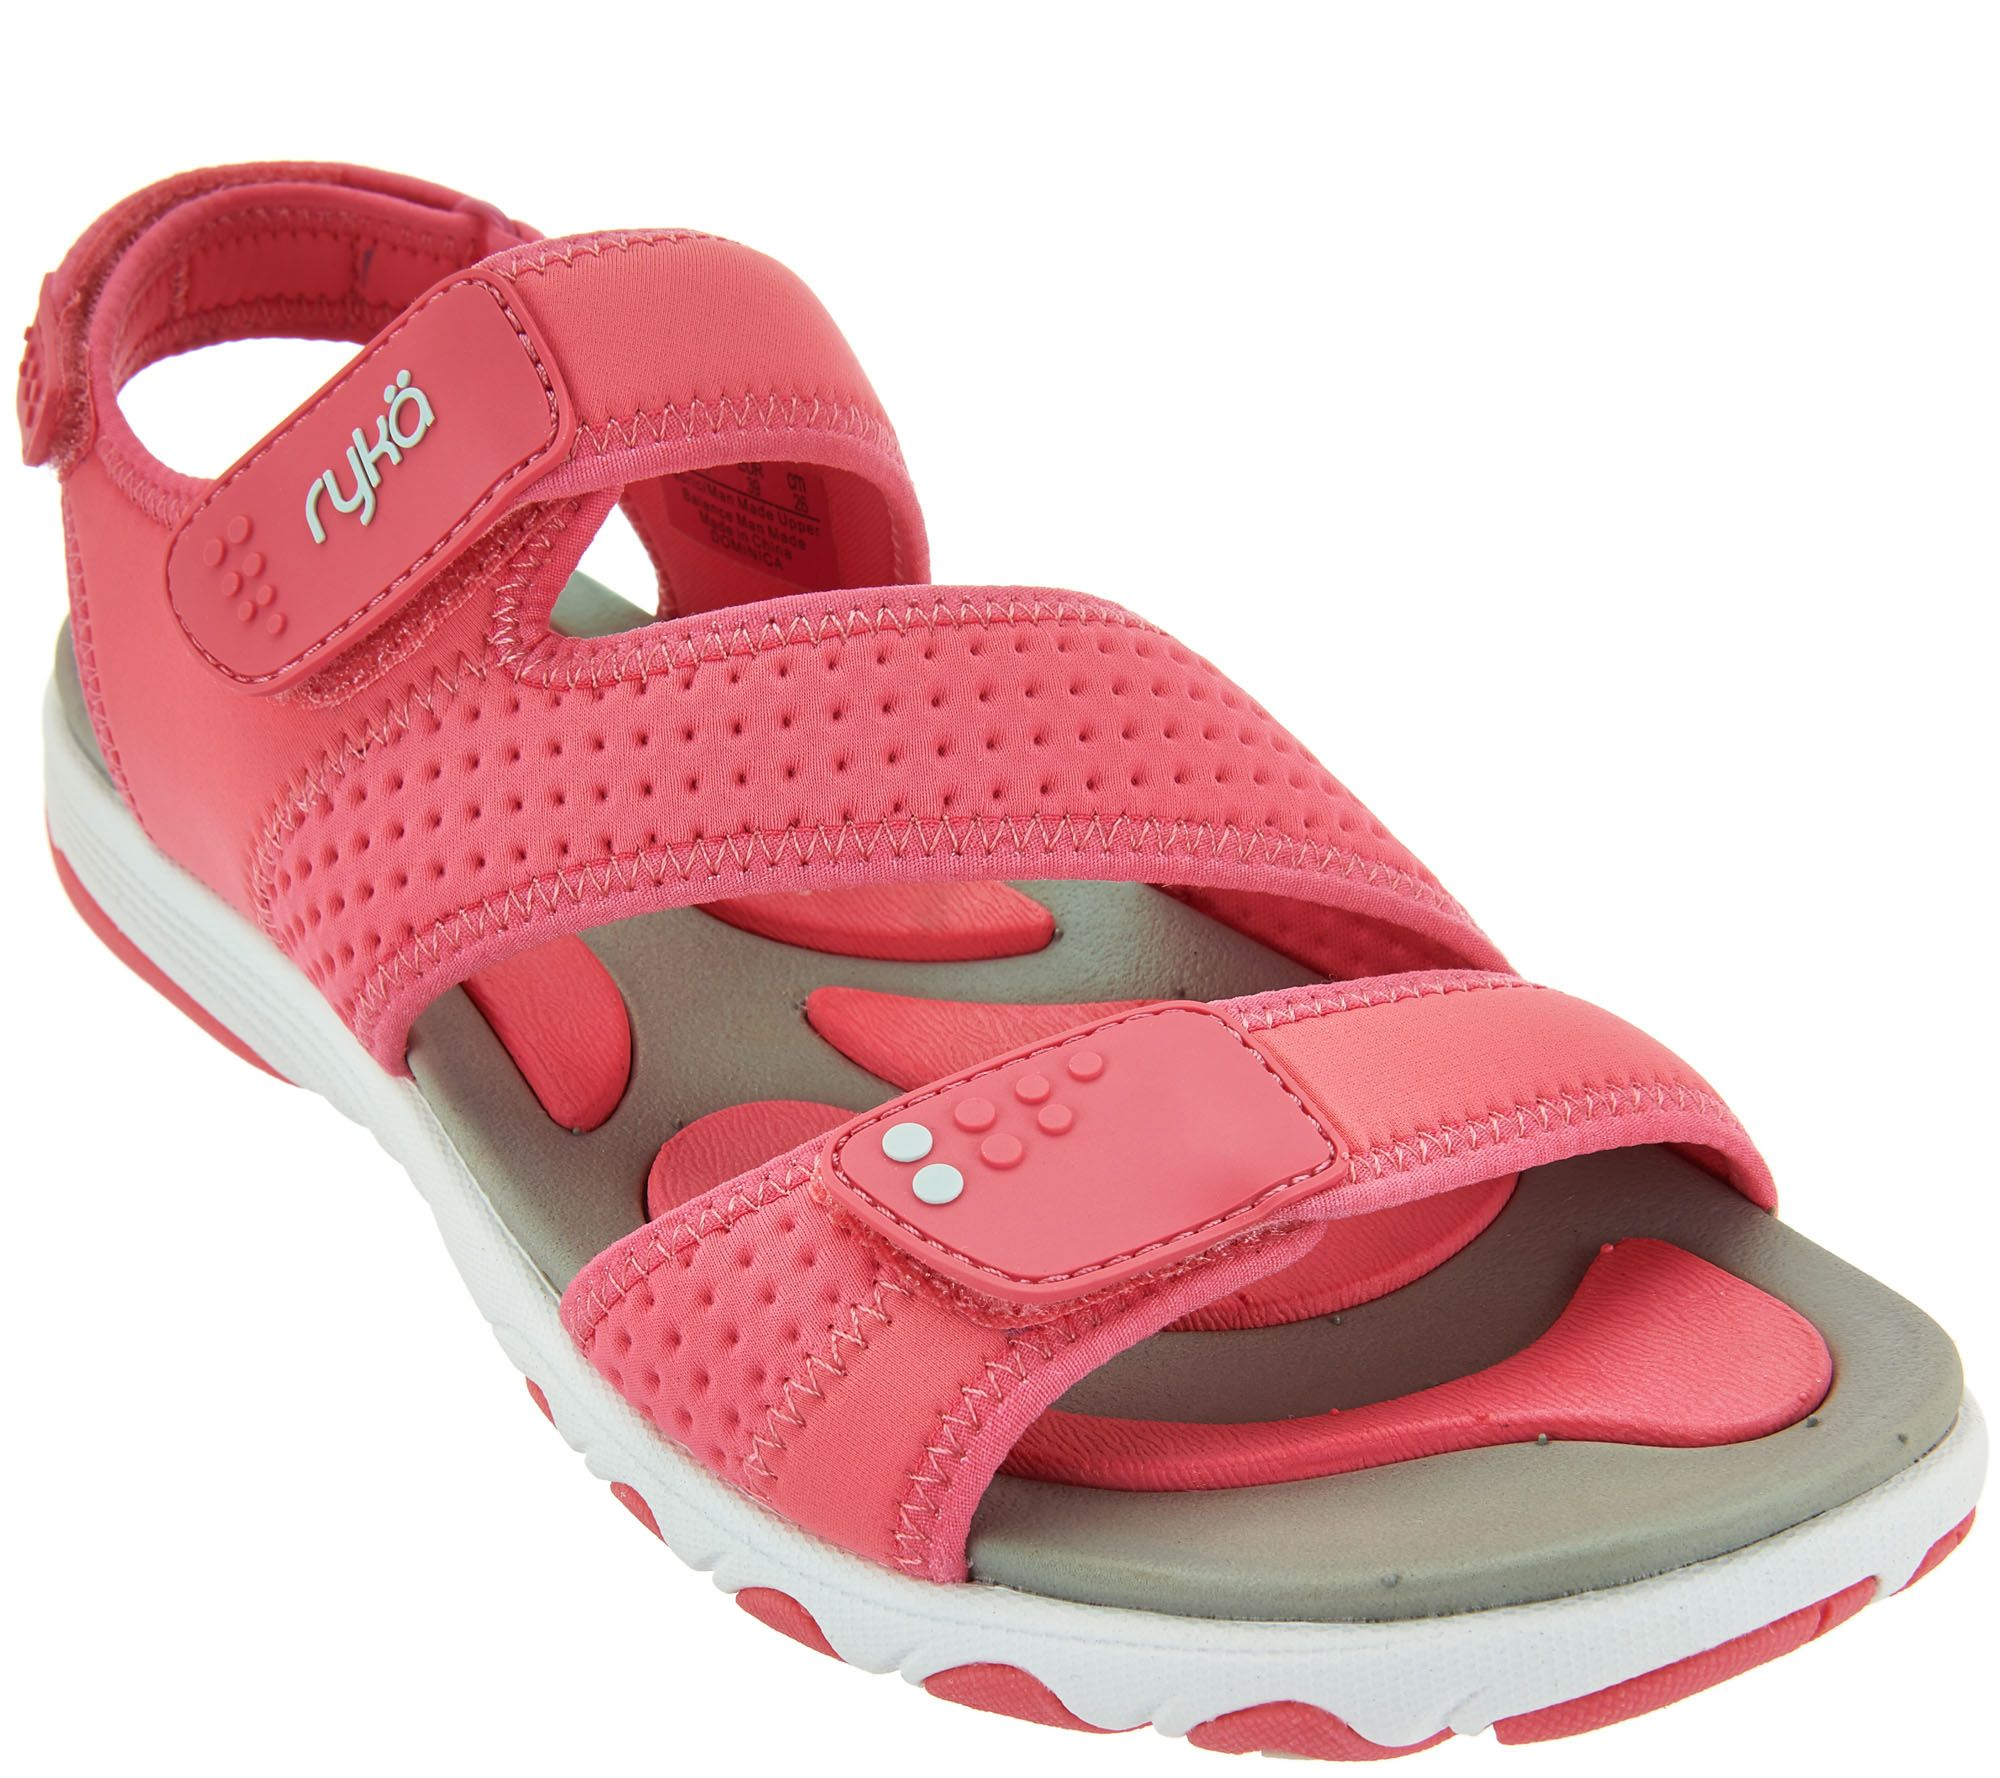 Ryka sandals shoes - Ryka Neoprene Adjustable Sport Sandals Dominica A288613